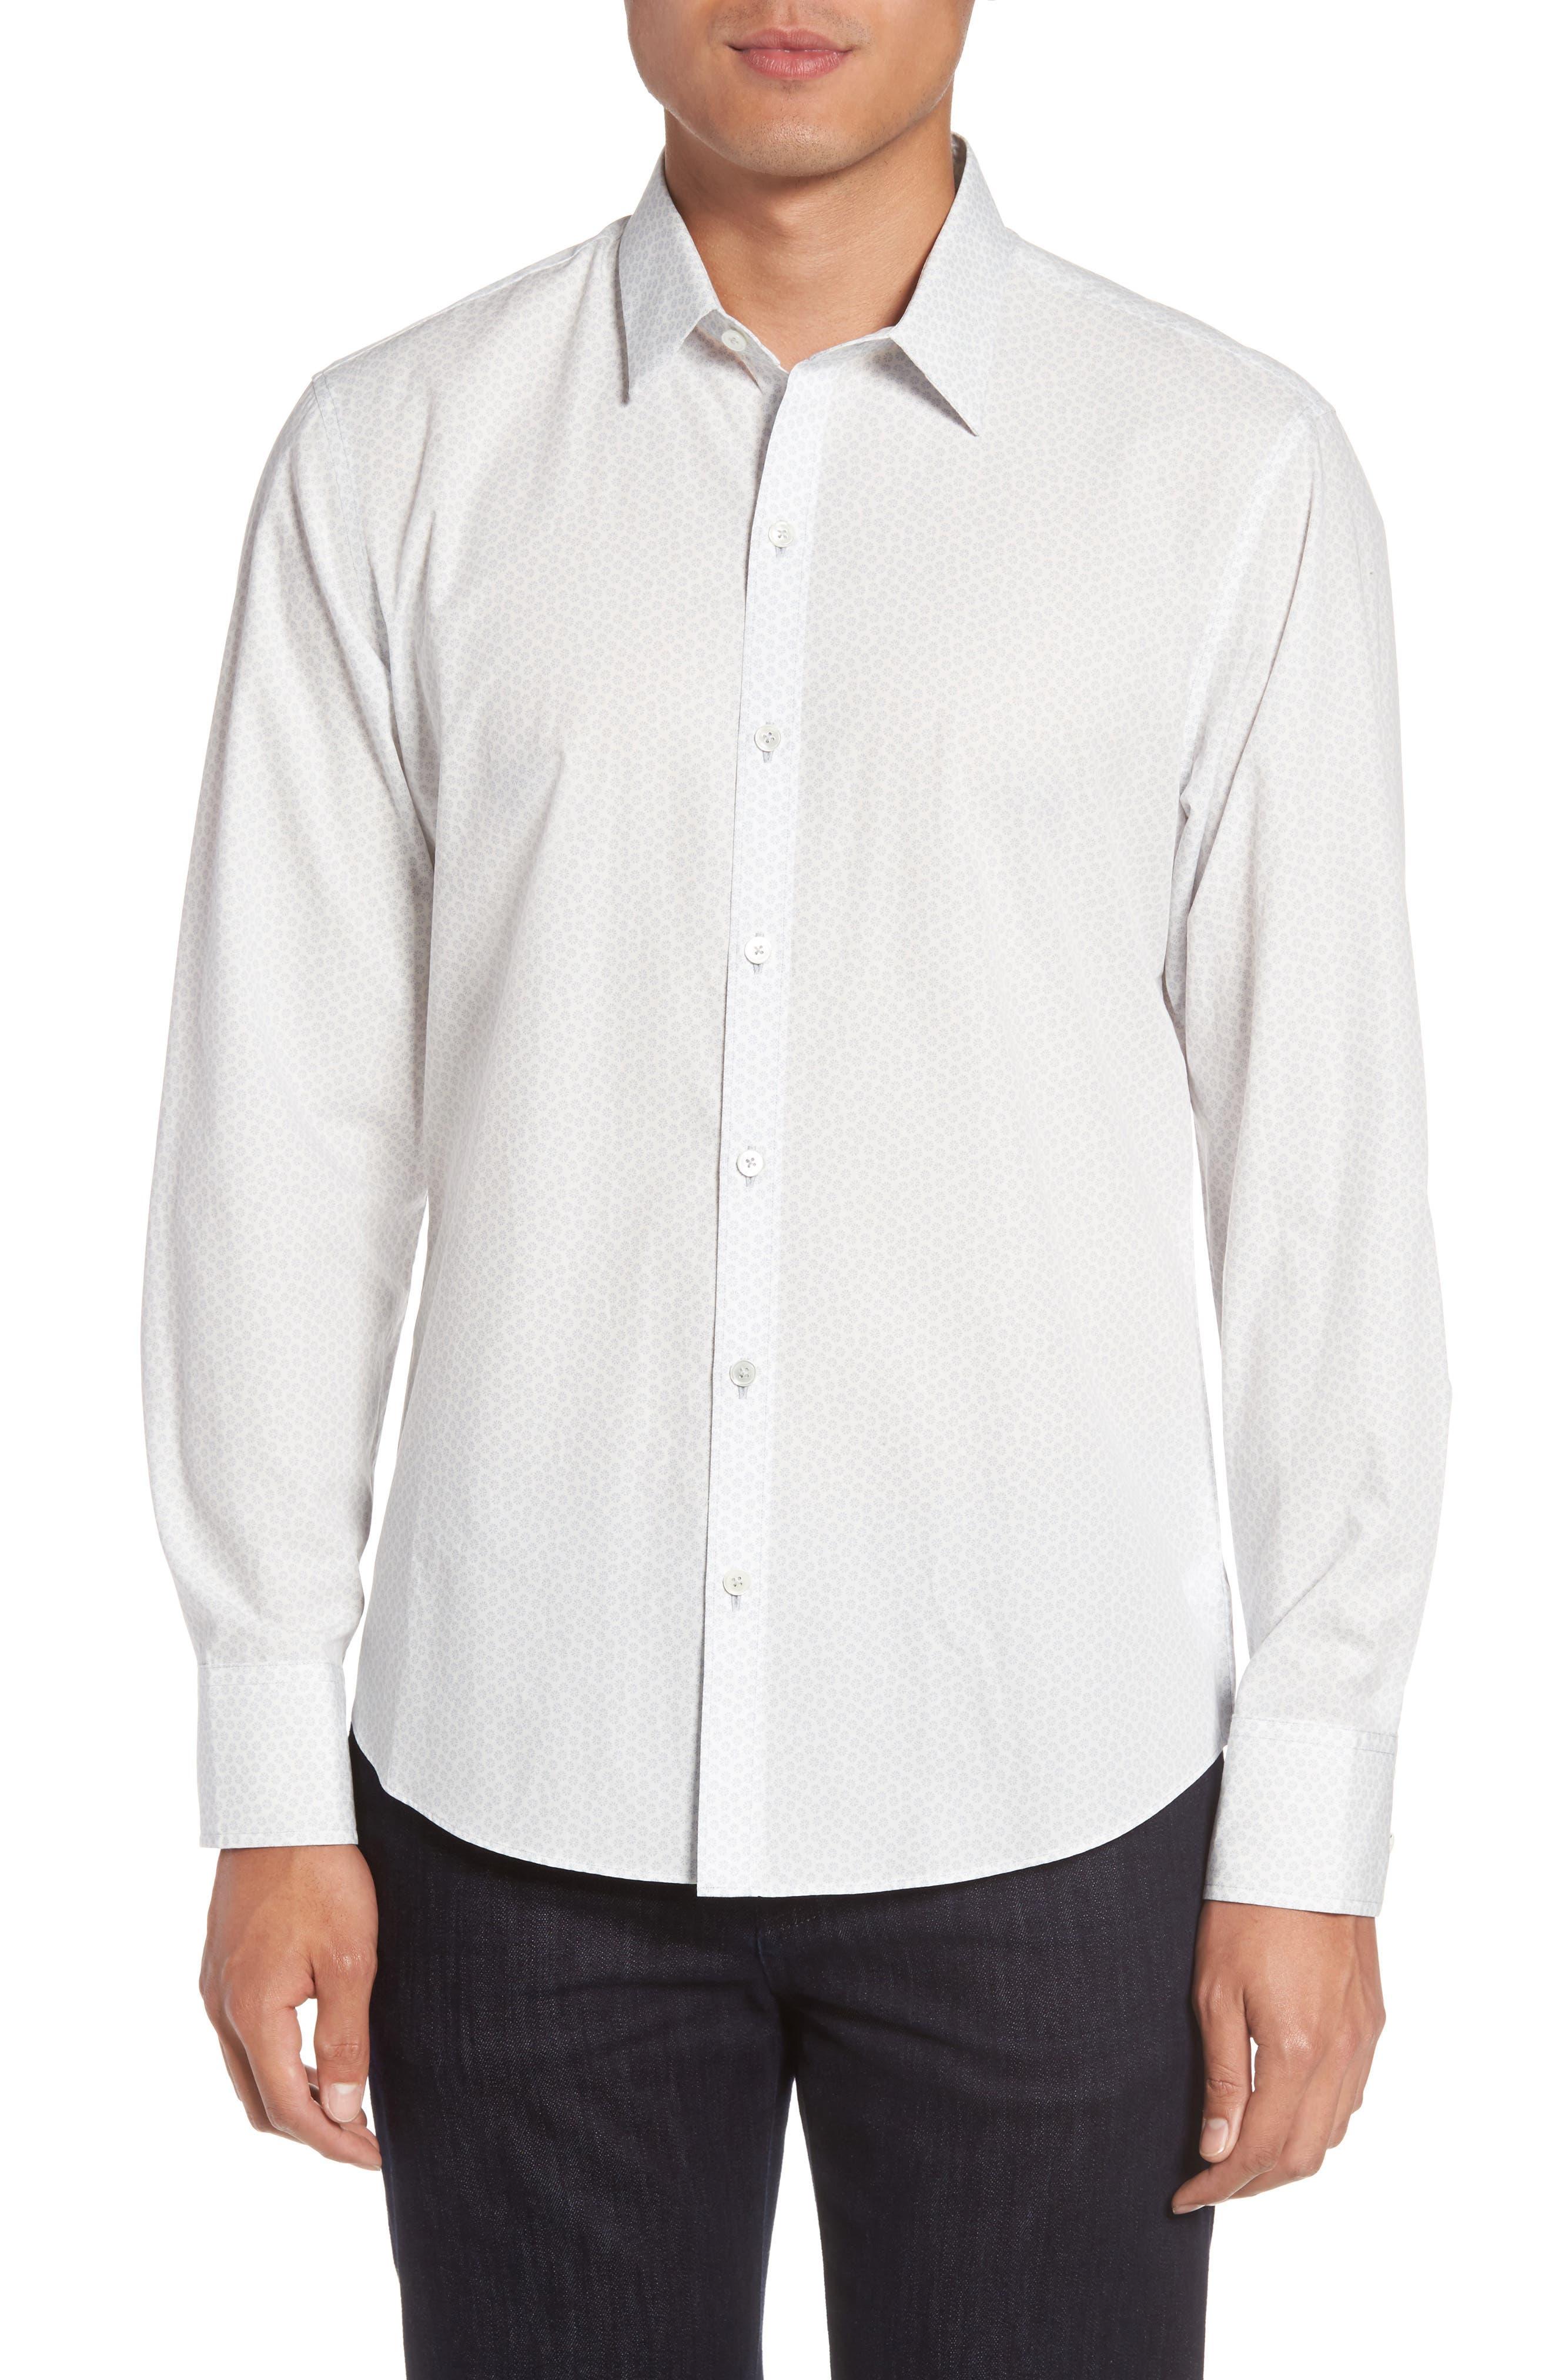 Main Image - Zachary Prell Owens Slim Fit Print Sport Shirt